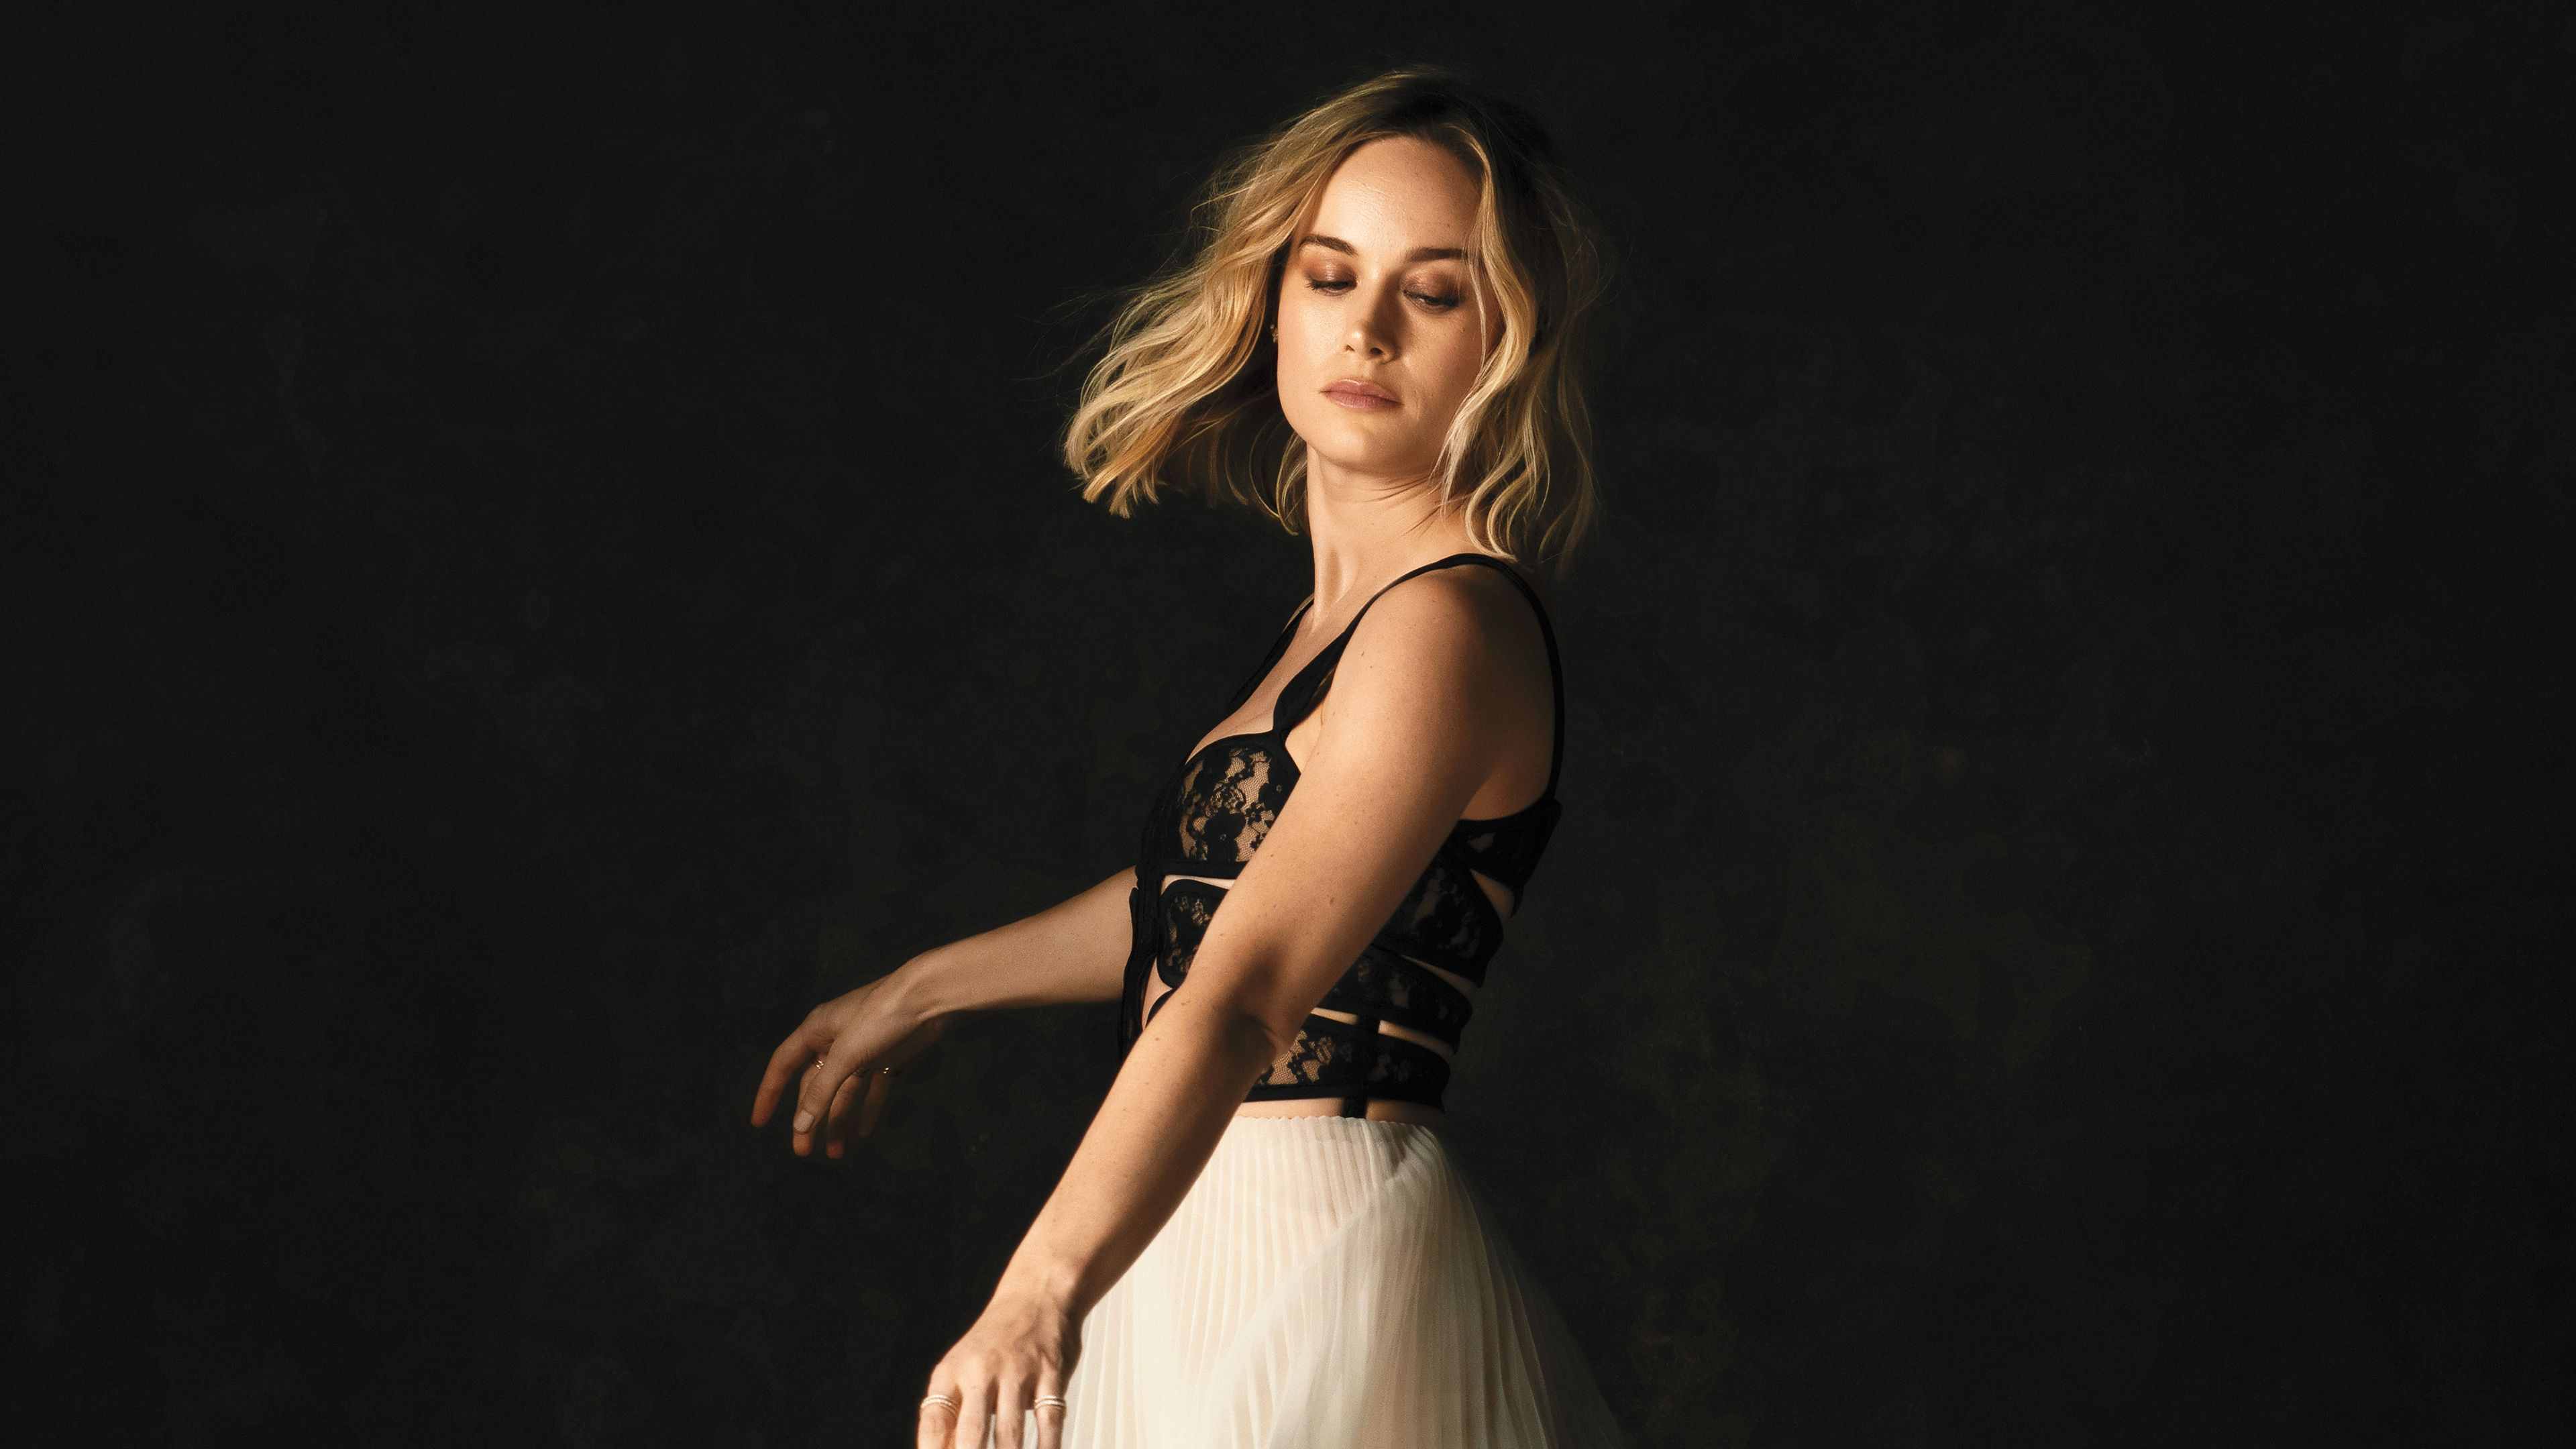 Brie Larson 2019 4k Brie Larson Too Faced Lipstick Bright Hair